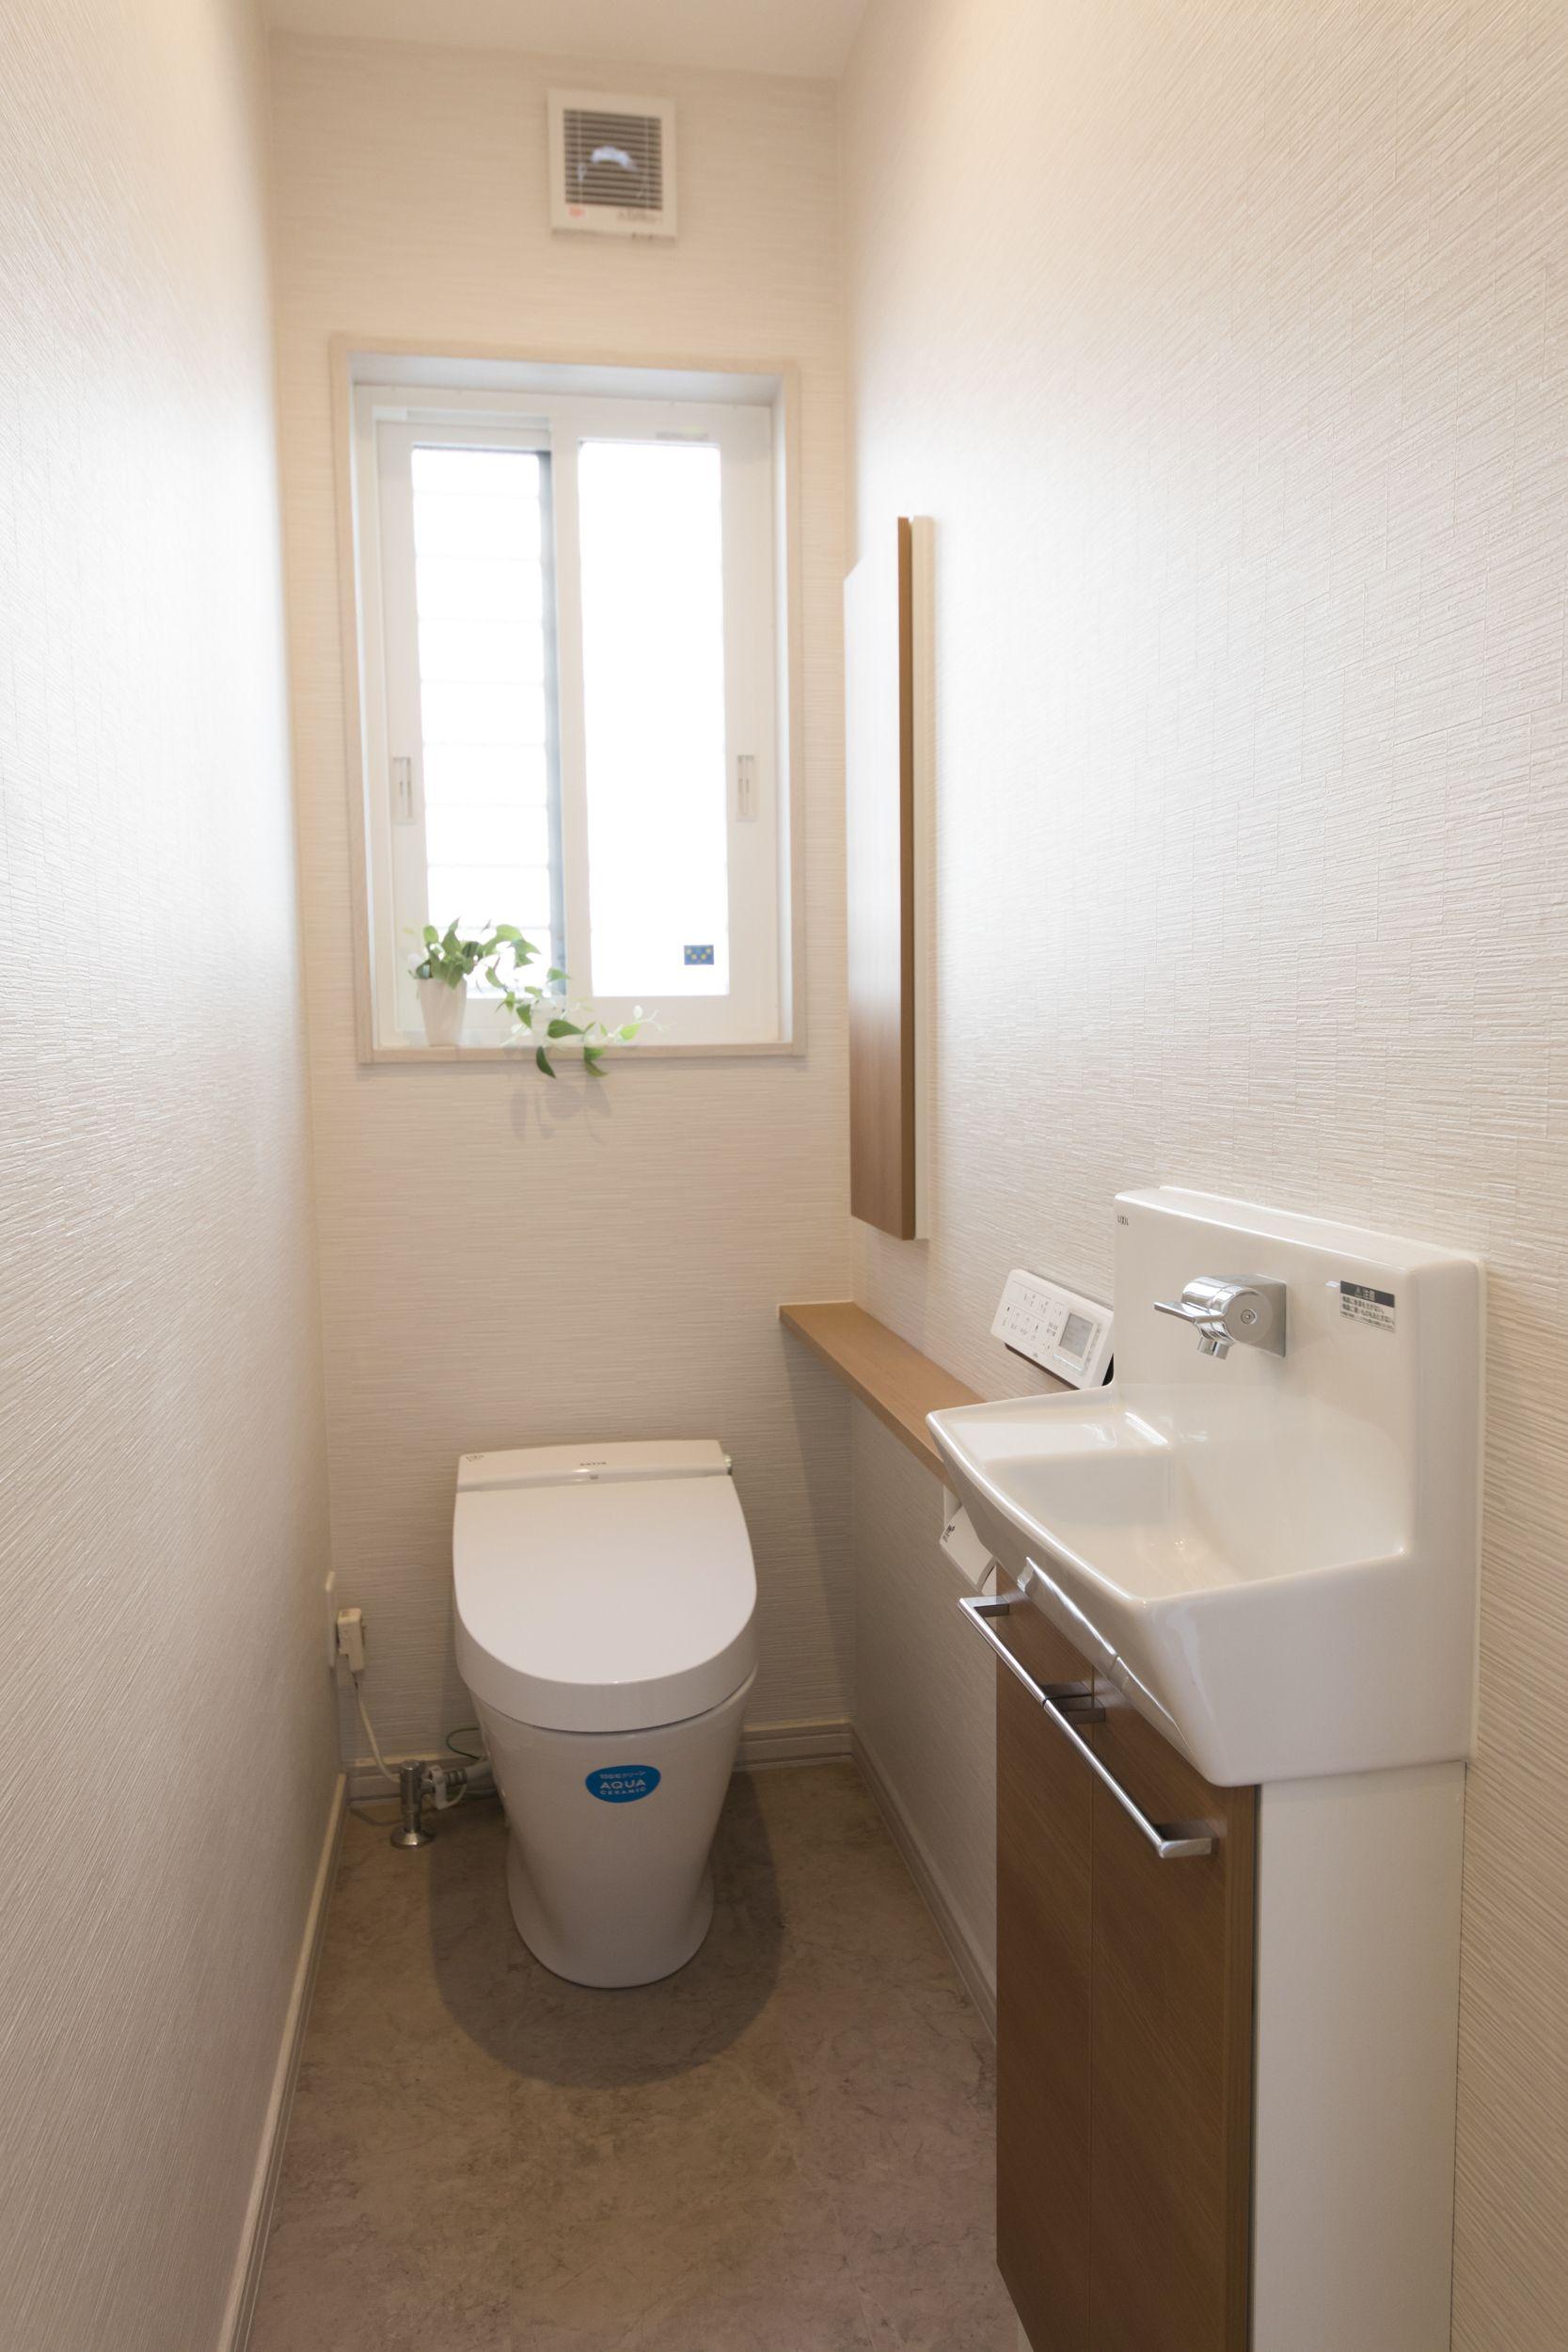 Lixil サティスs コフレル 壁小物収納 Lixil トイレ トイレ 壁紙 おしゃれ トイレのデザイン